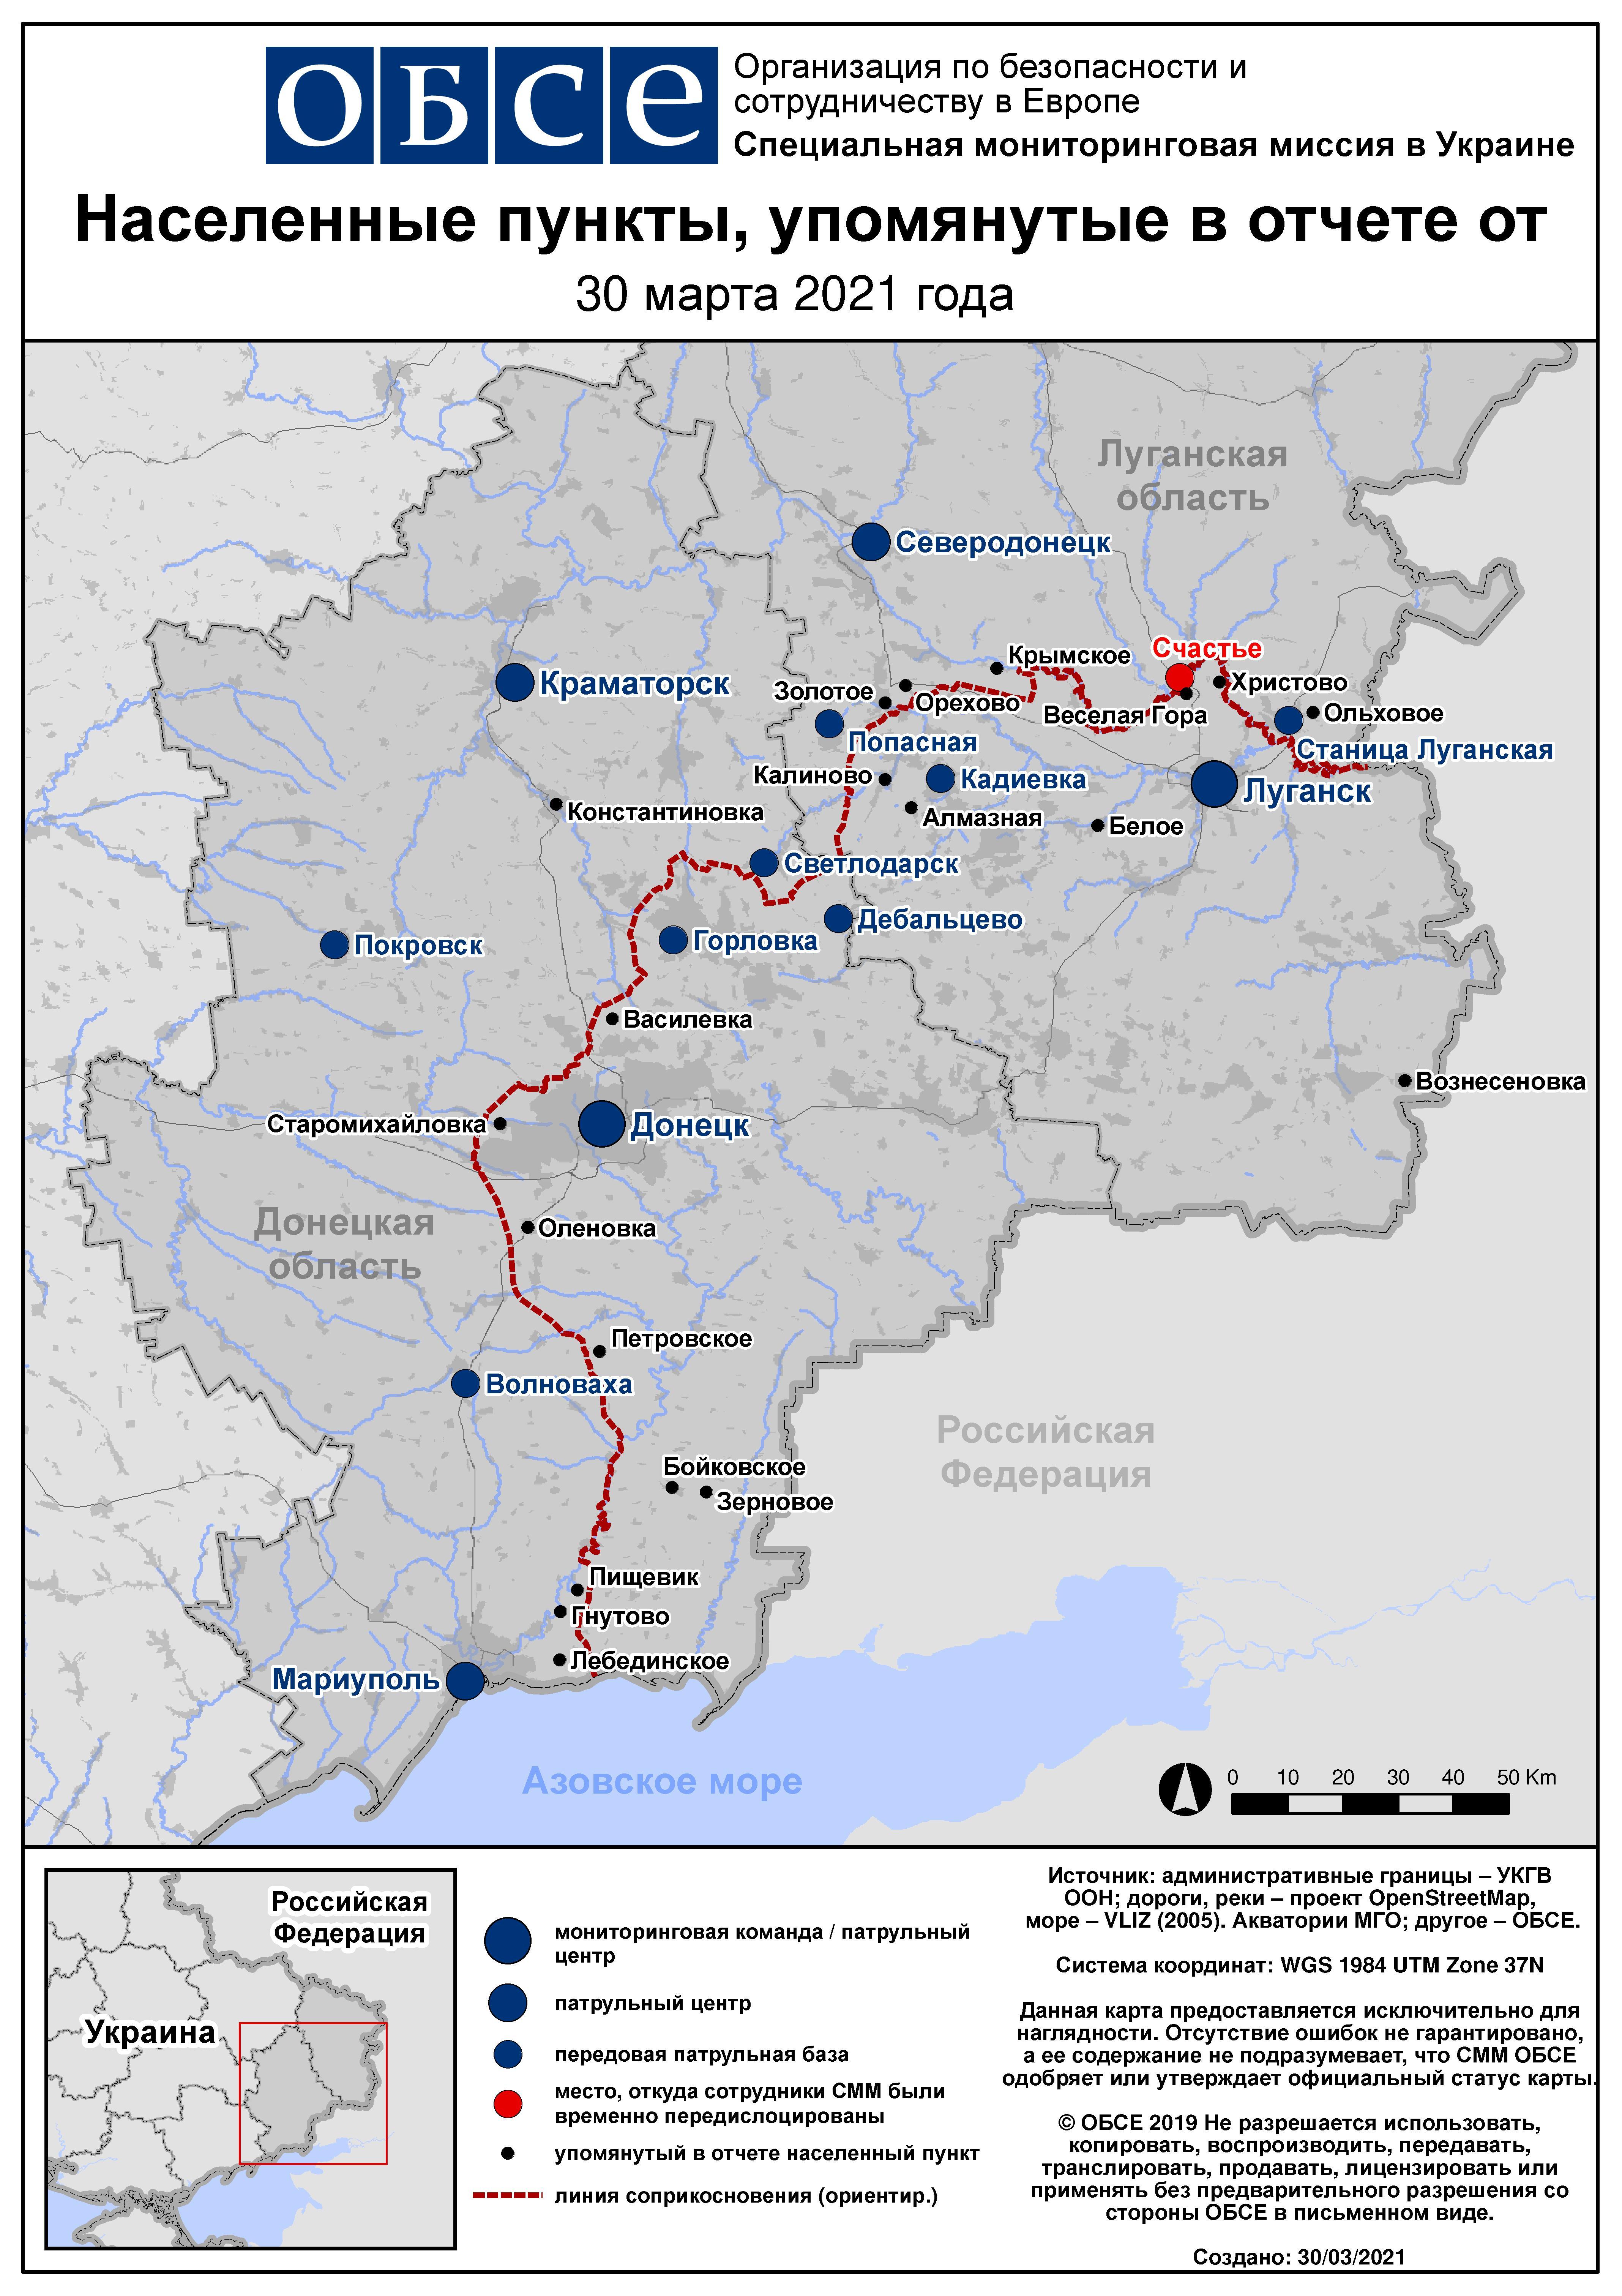 map_settlements--2021-03-29